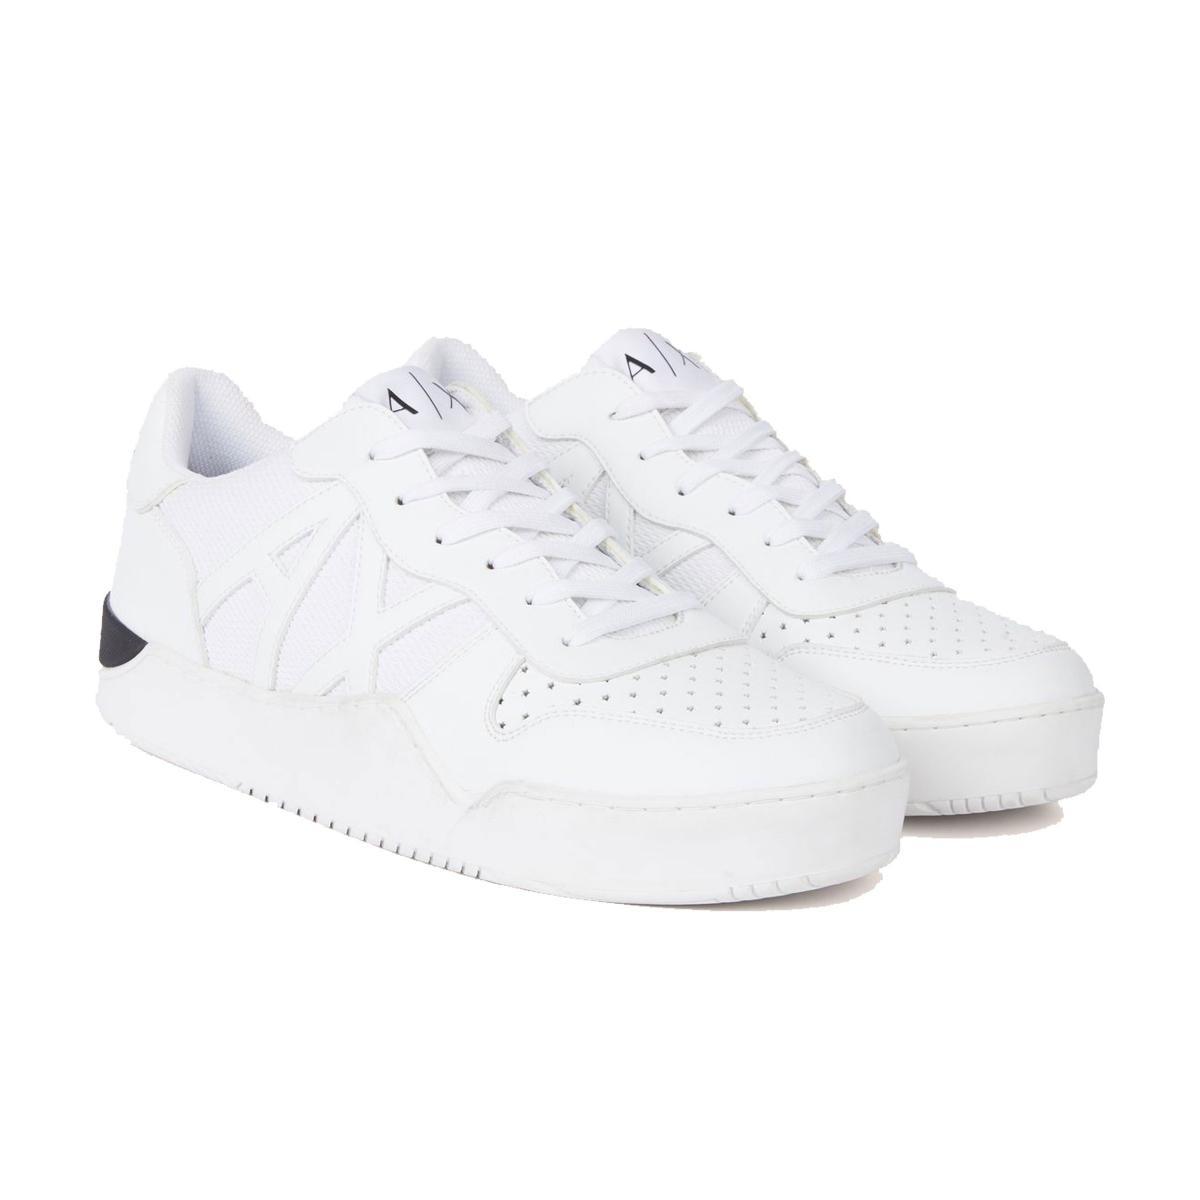 Scarpe Sneakers Armani Exchange da uomo rif. XUX009 XV012